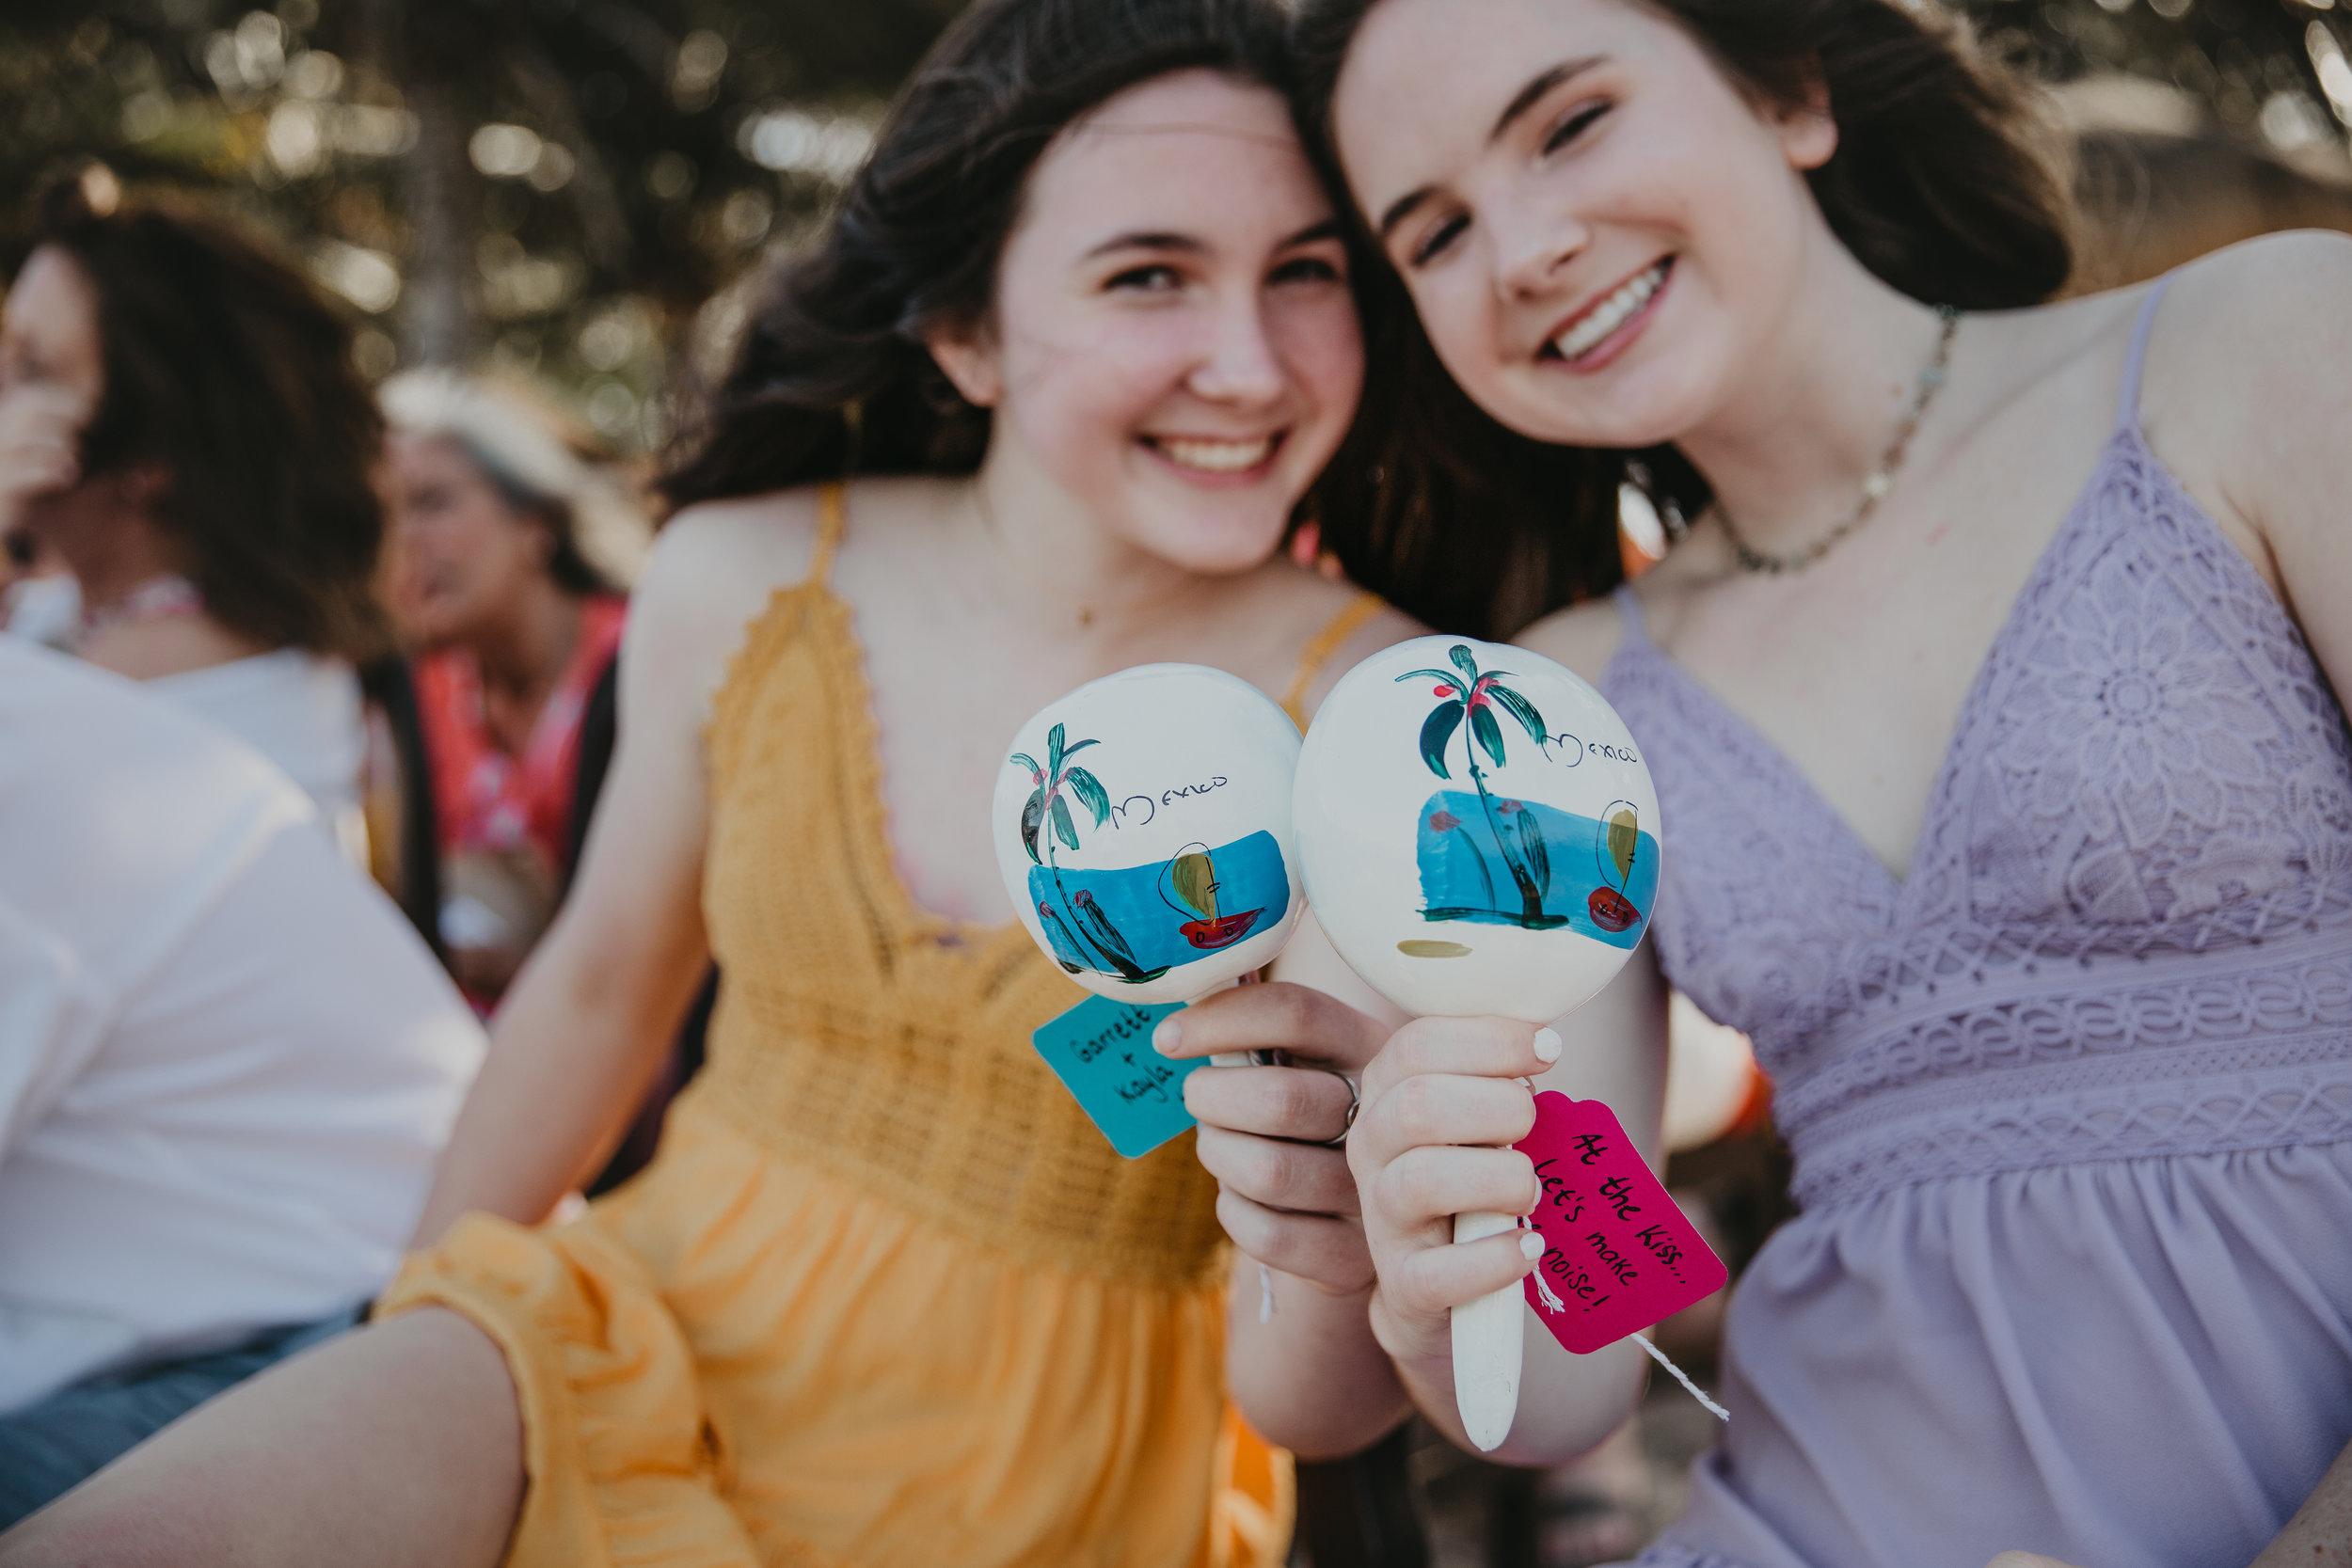 Nicole-Daacke-Photography-beachfront-akumal-destionation-wedding-tulum-mexico-elopement-photographer-destination-wedding-inspiration-sunset-champagne-pop-boho-bride-ocean-tropical-bohemian-tulum-wedding-photos-152.jpg